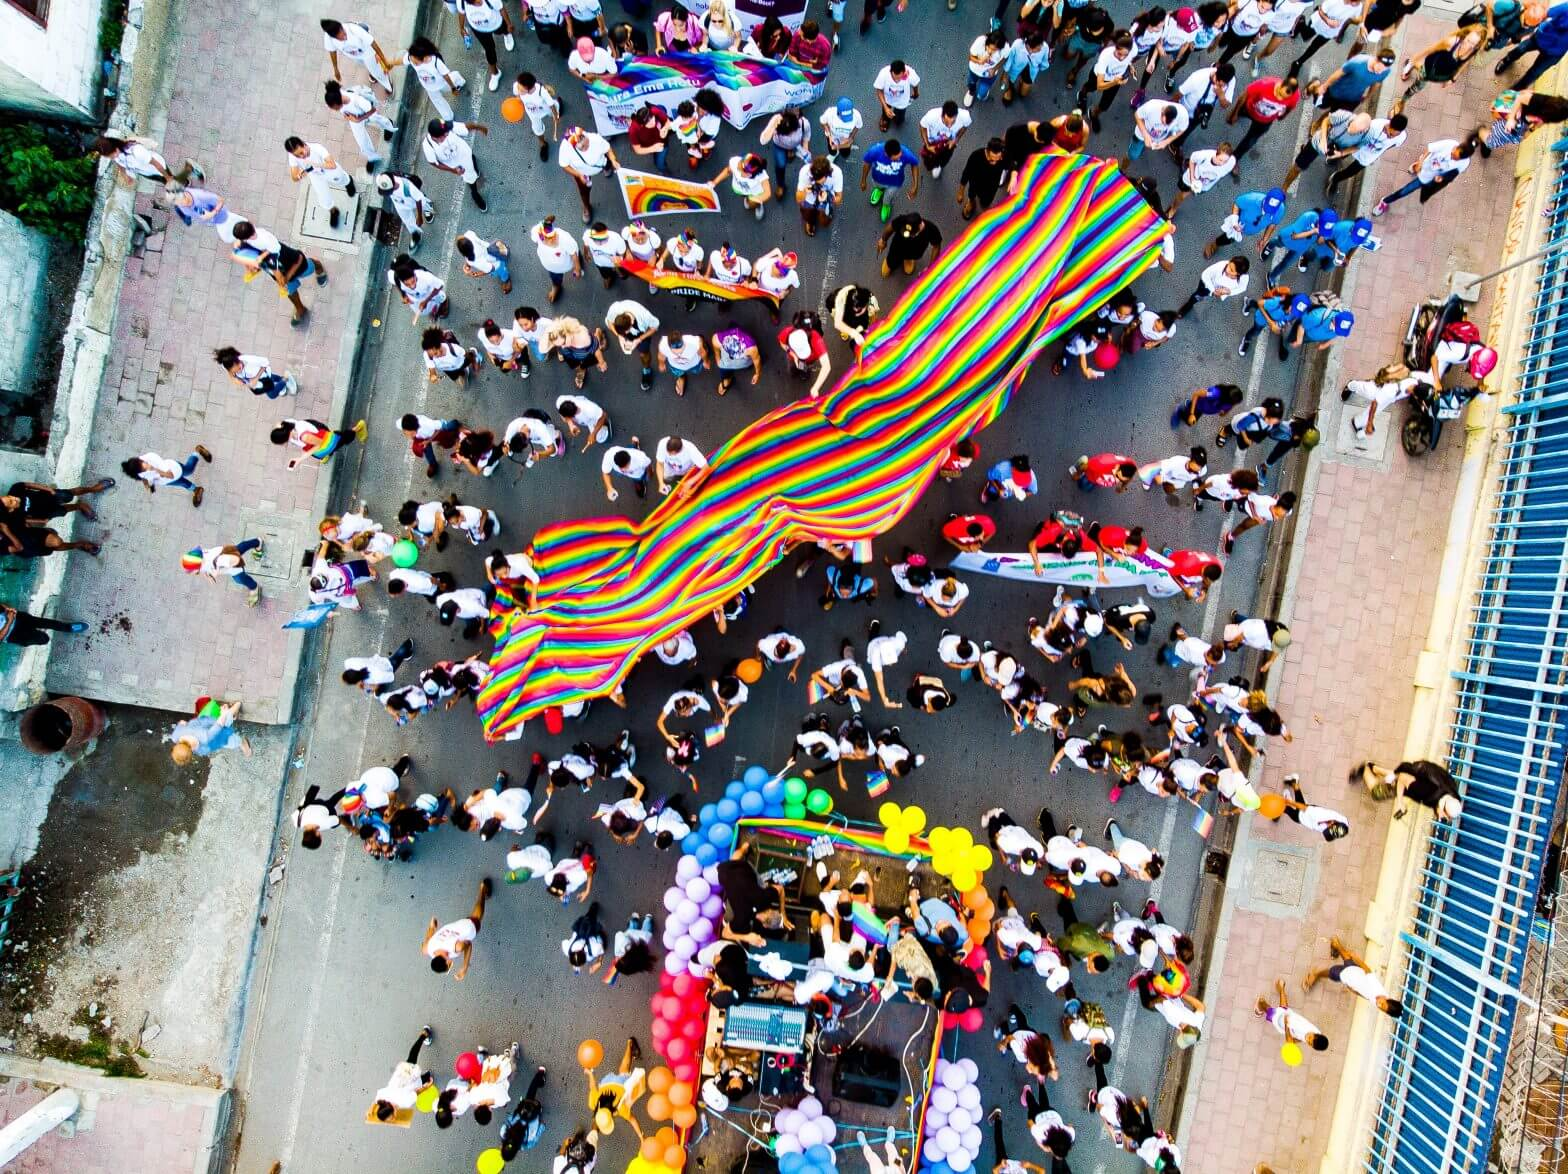 Pride month LGBTQ employee rights discrimination